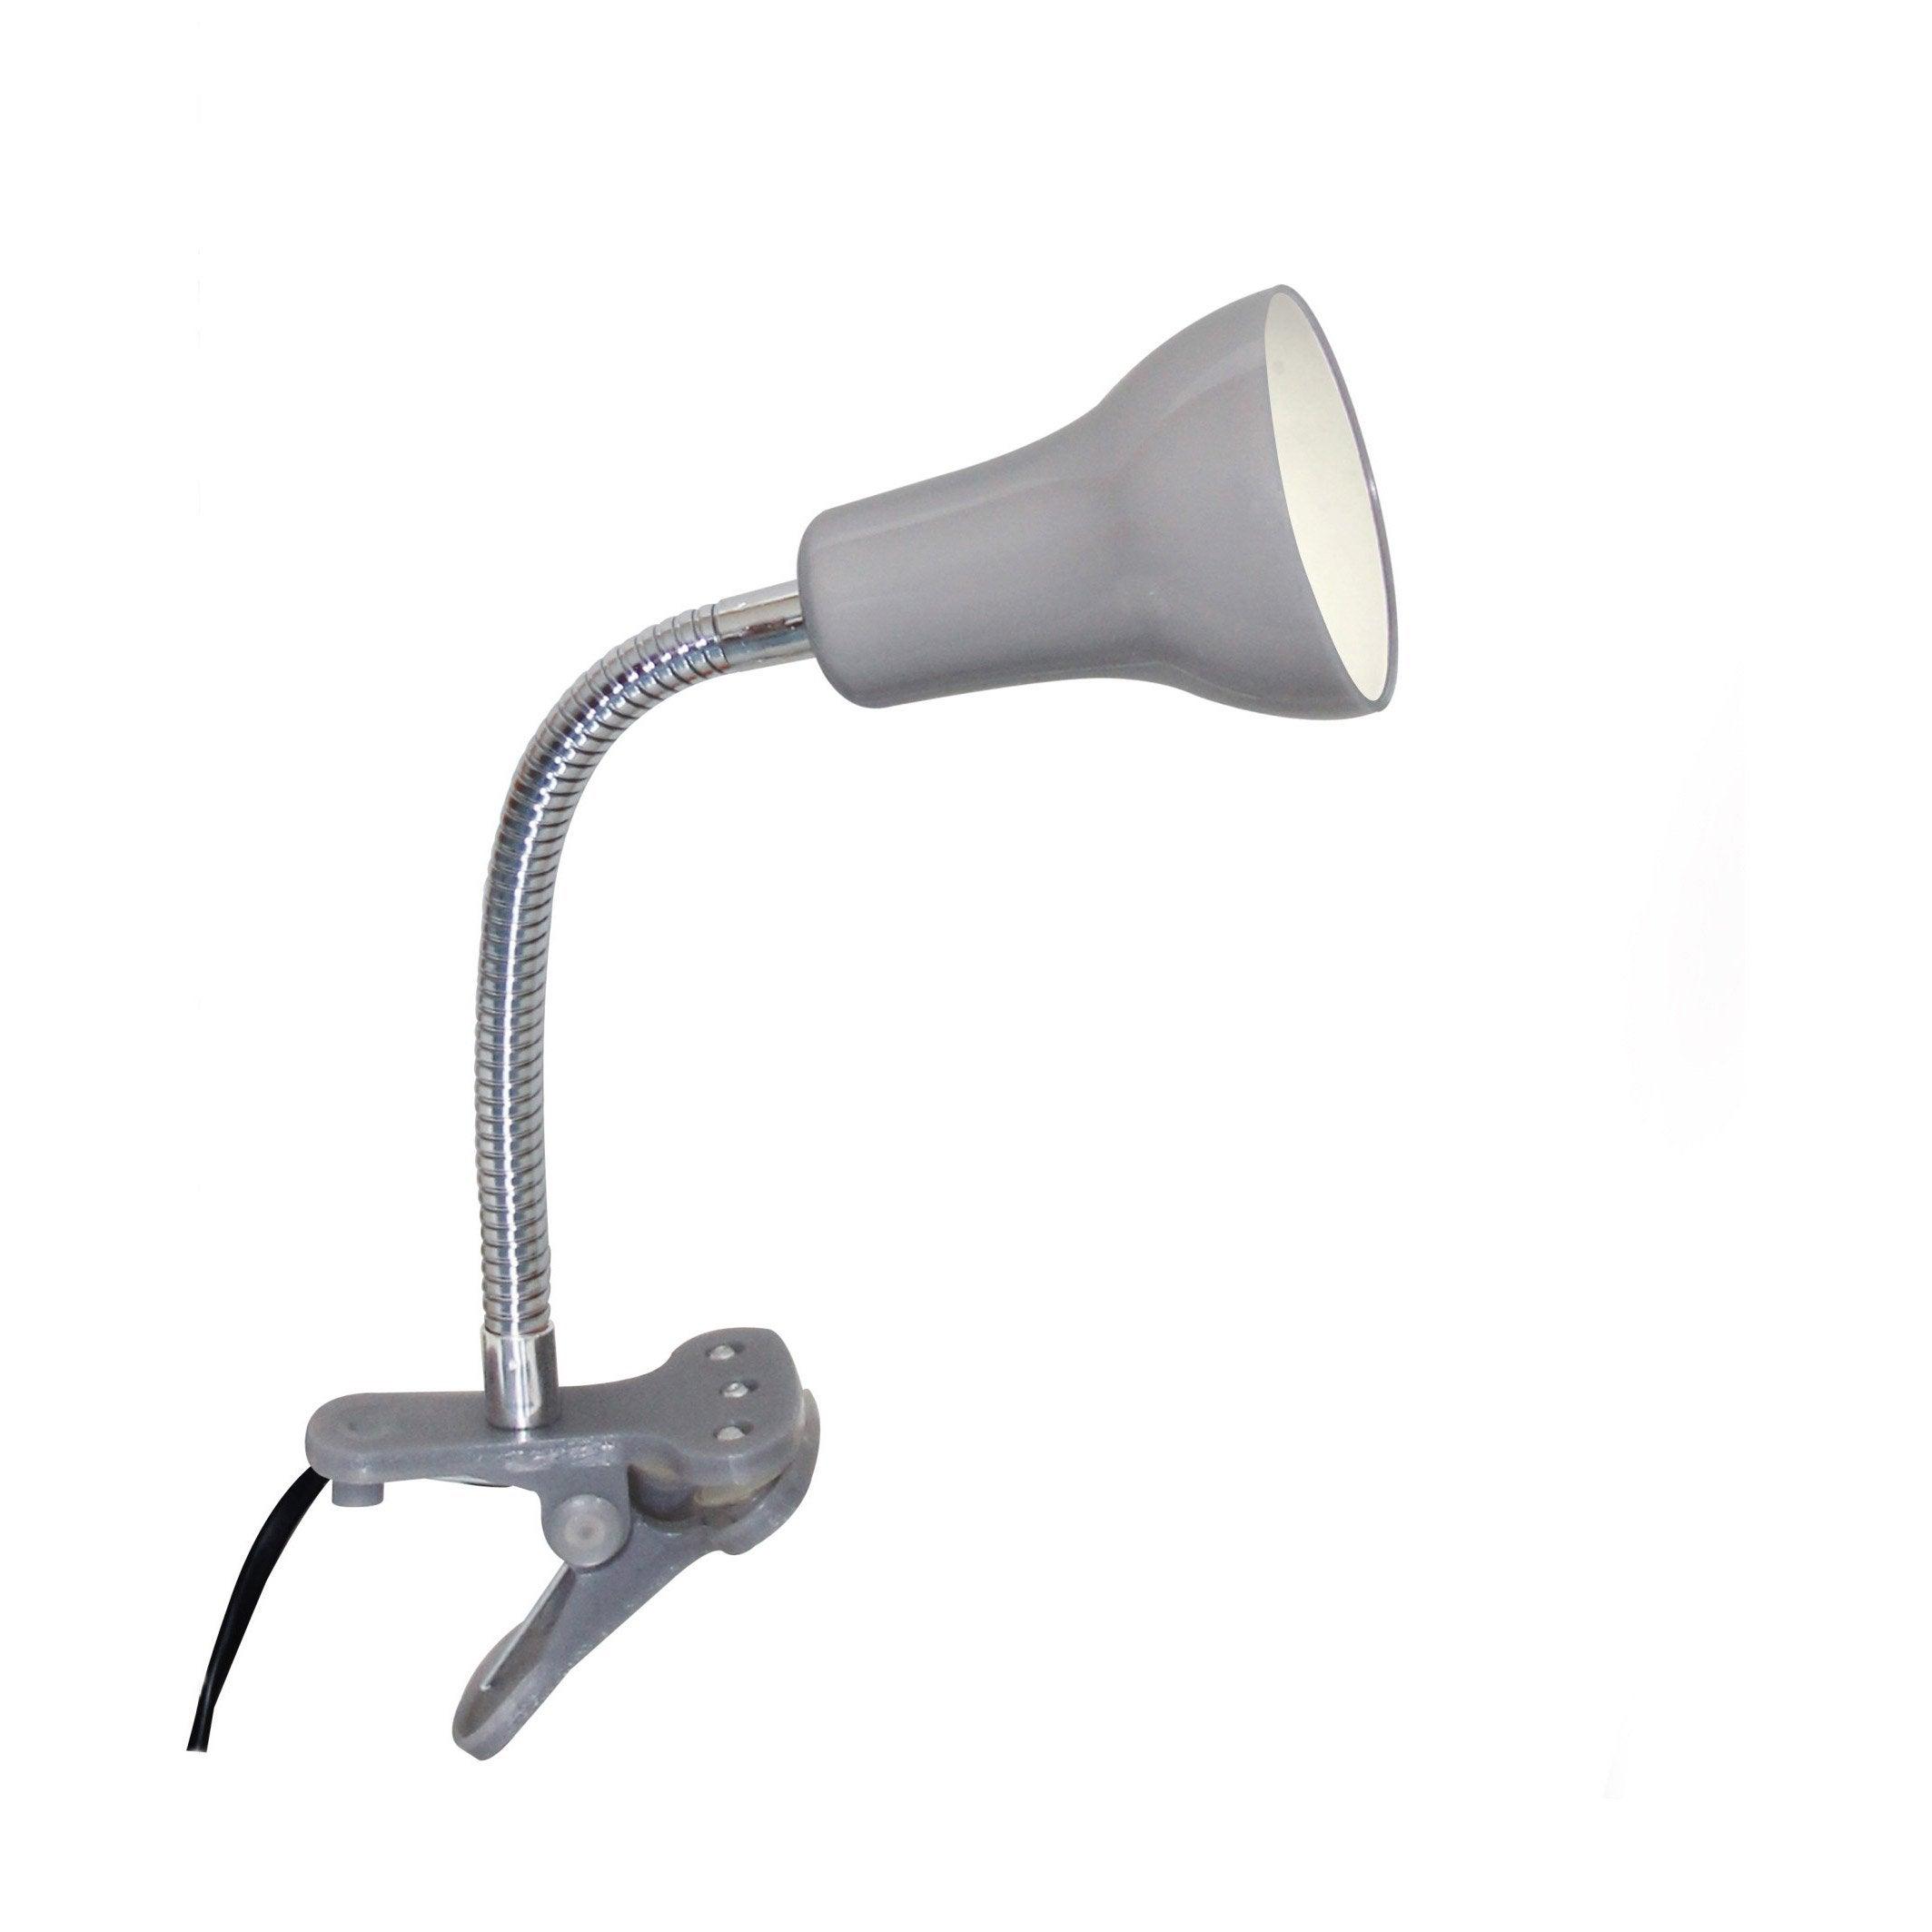 Lampe de bureau à pince, moderne, plastique gris commande, INSPIRE Salta